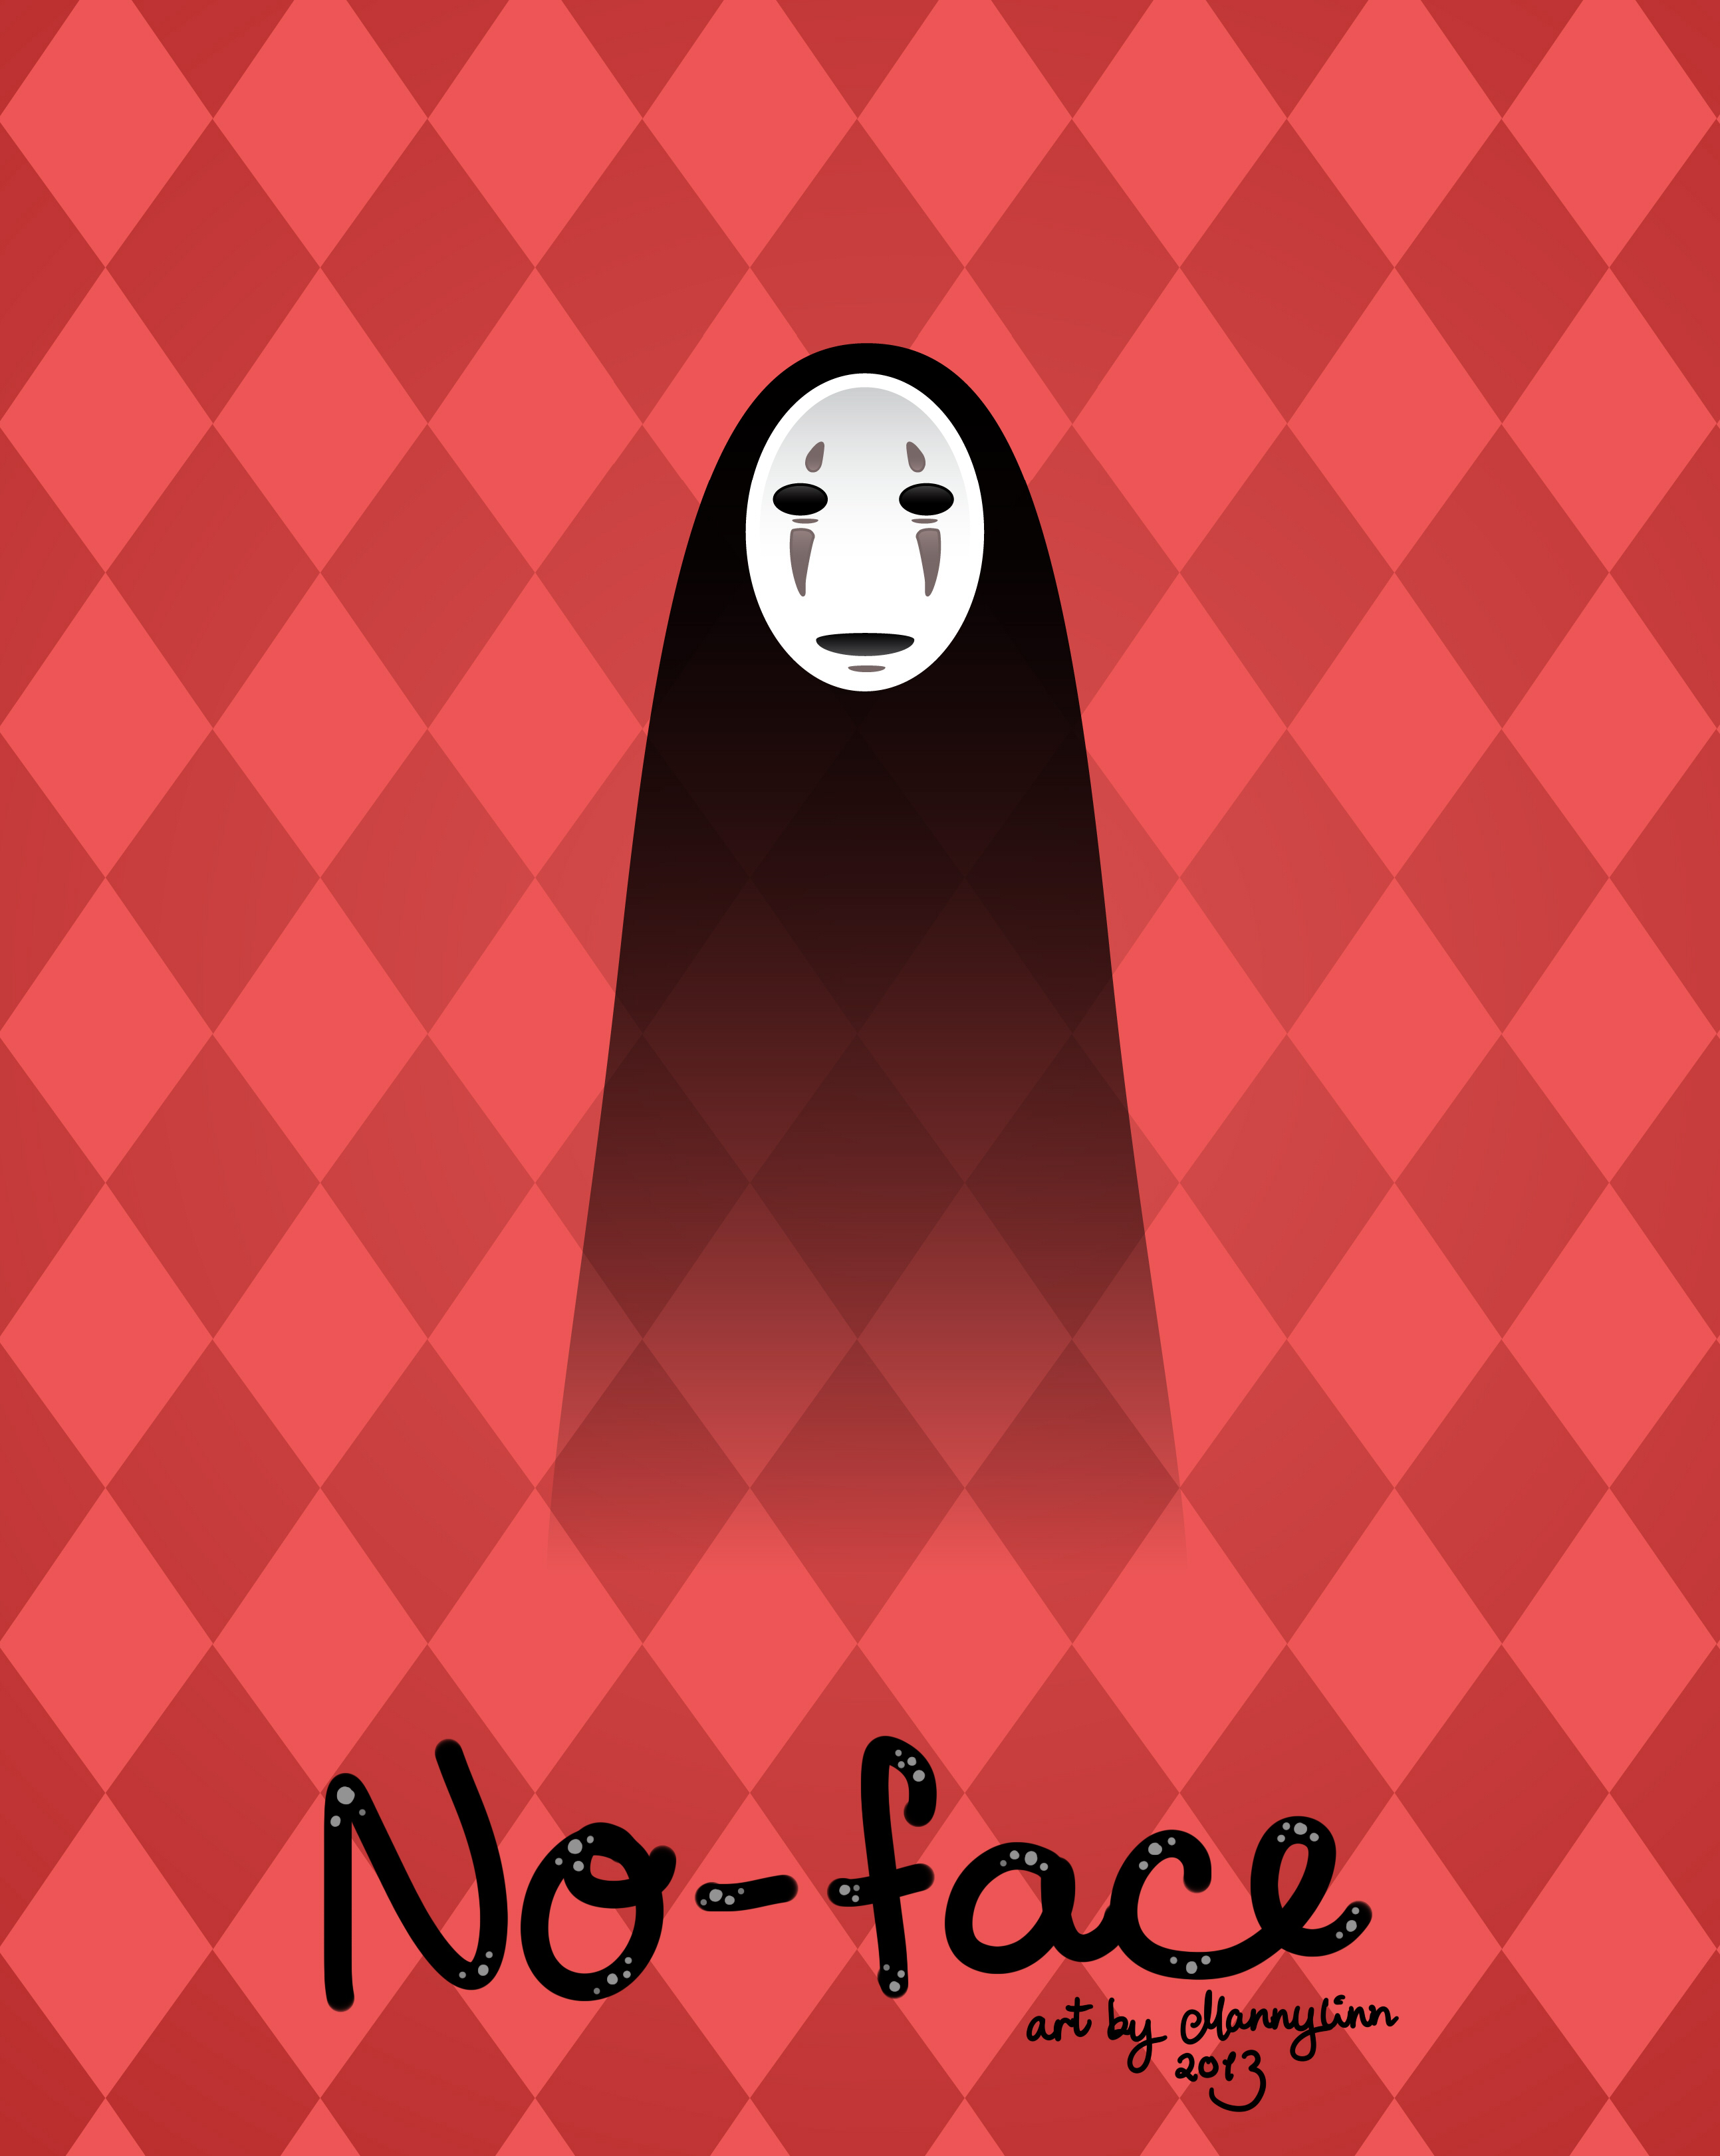 No-face by Mannylinn